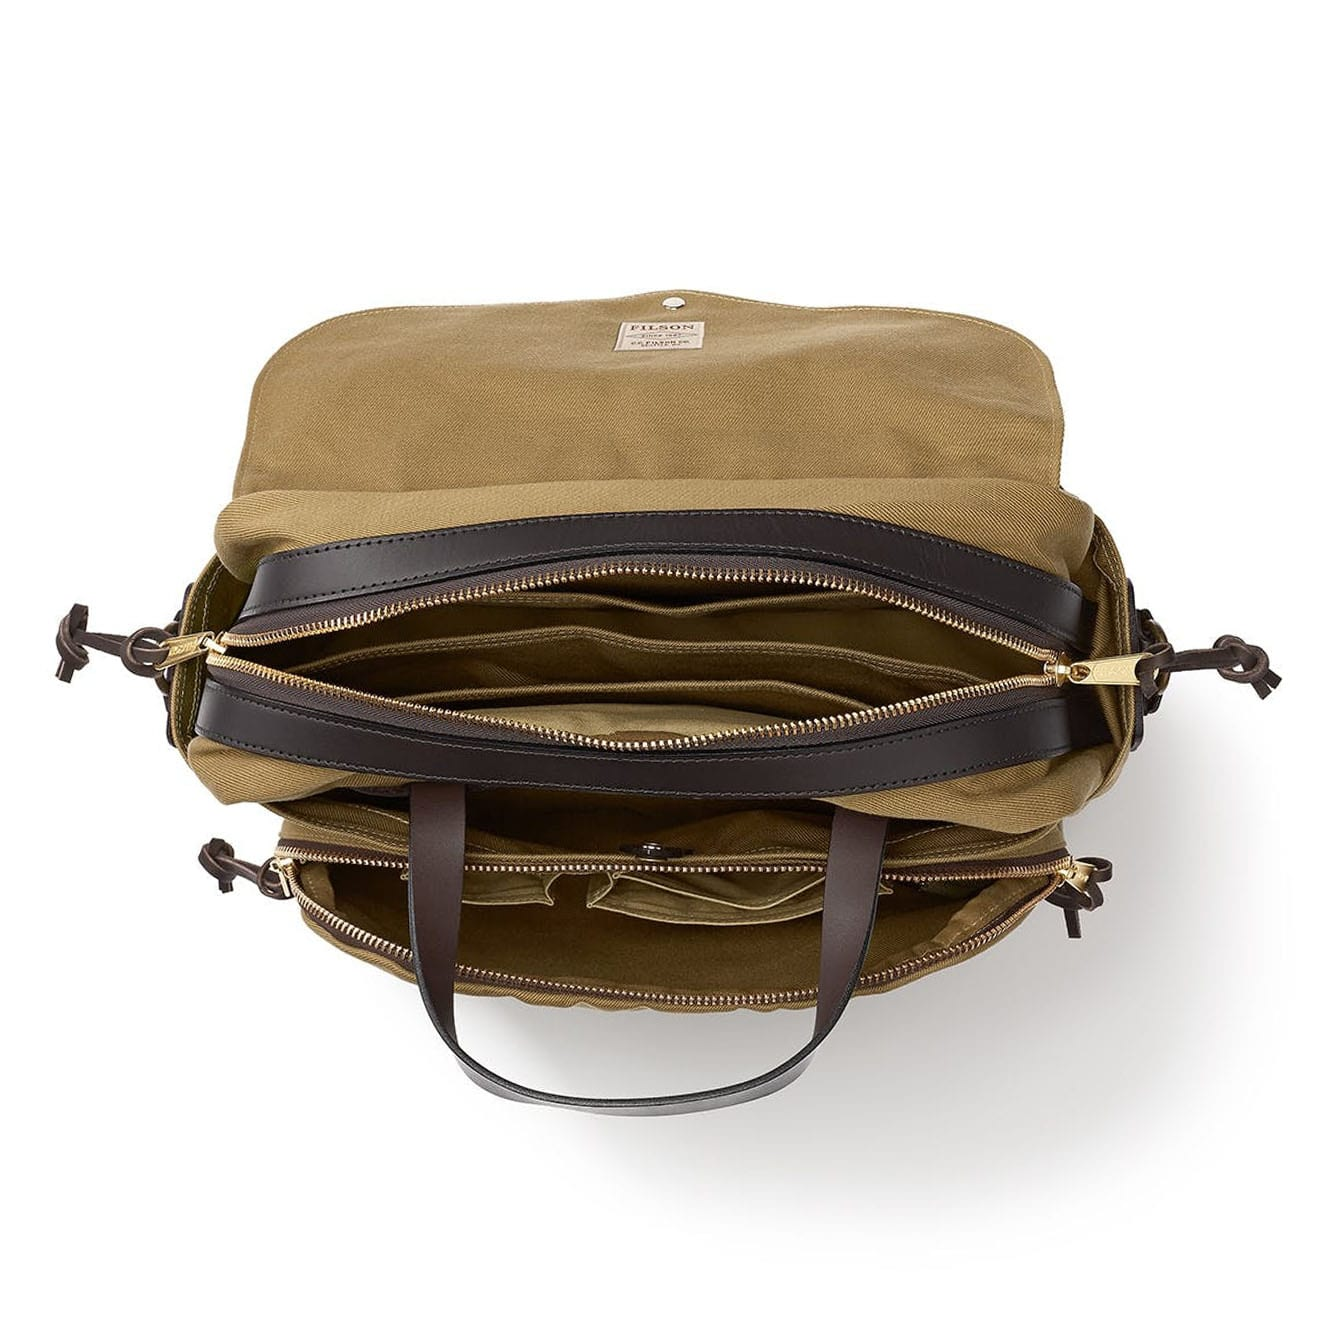 d3544a1dbf55 Filson Rugged Twill Padded Computer Bag Tan - The Sporting Lodge